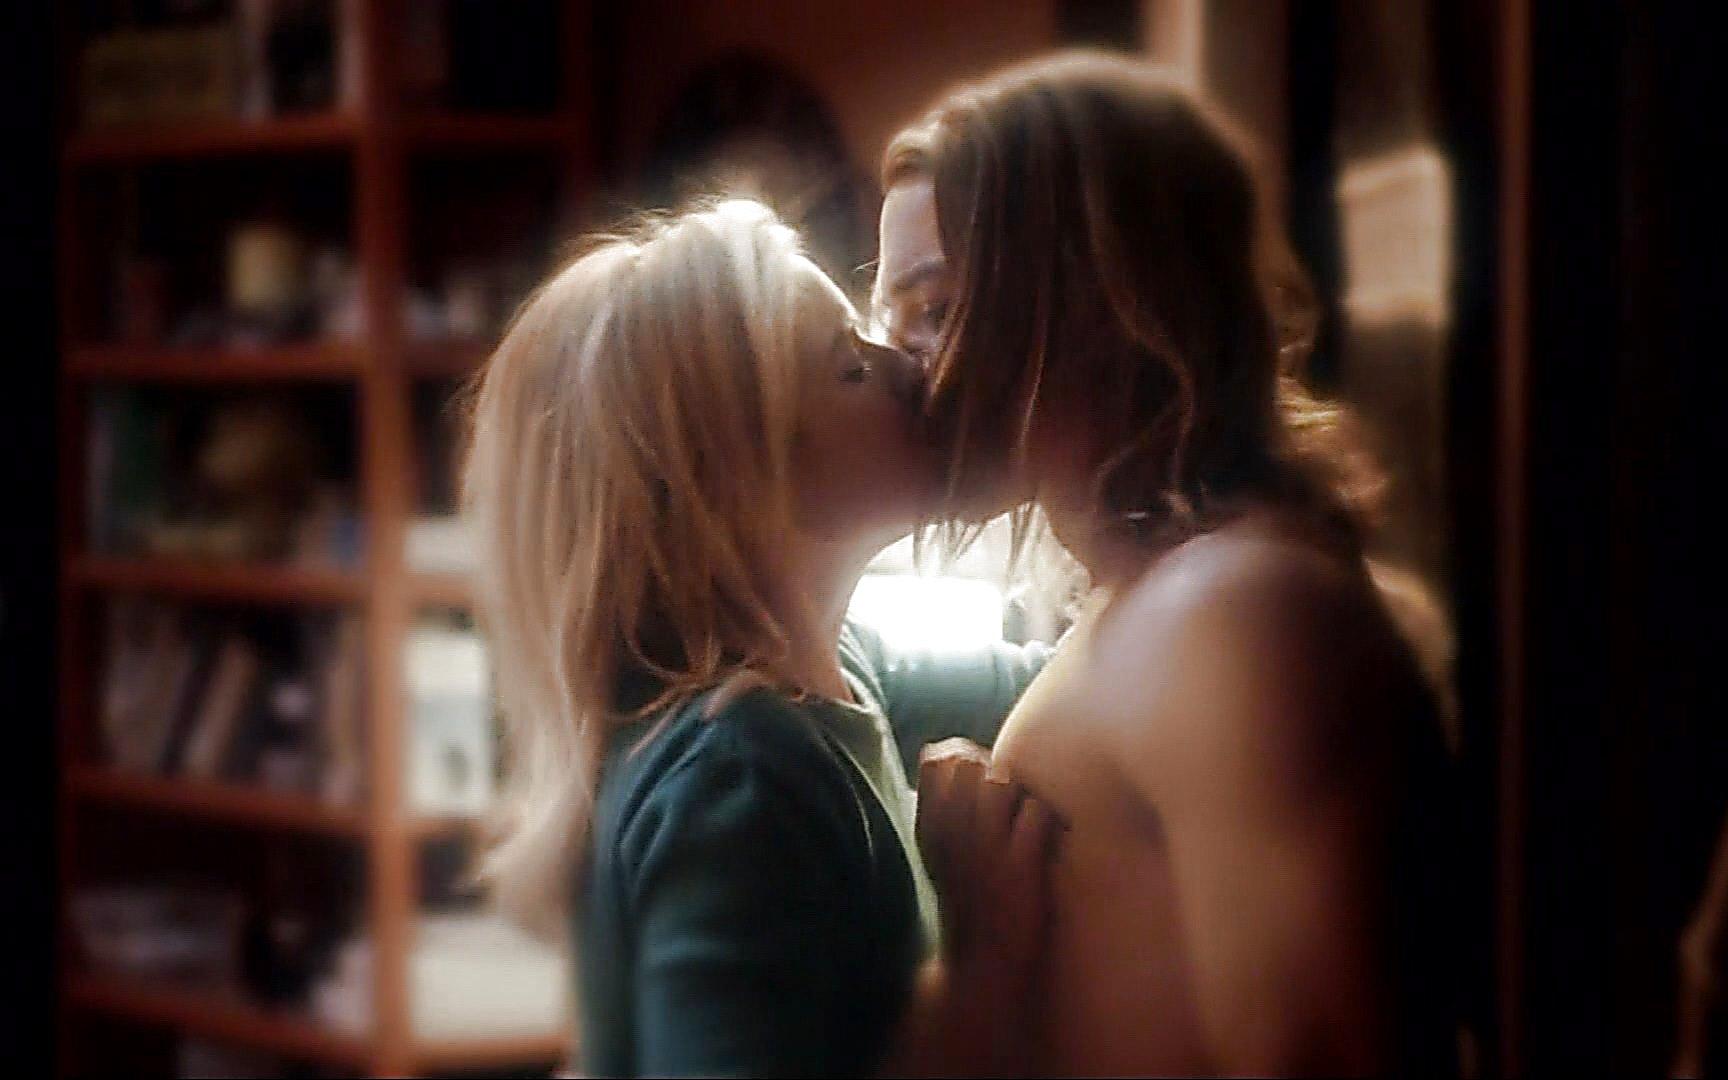 Craig Horner sexy shirtless scene February 22, 2015, 7pm